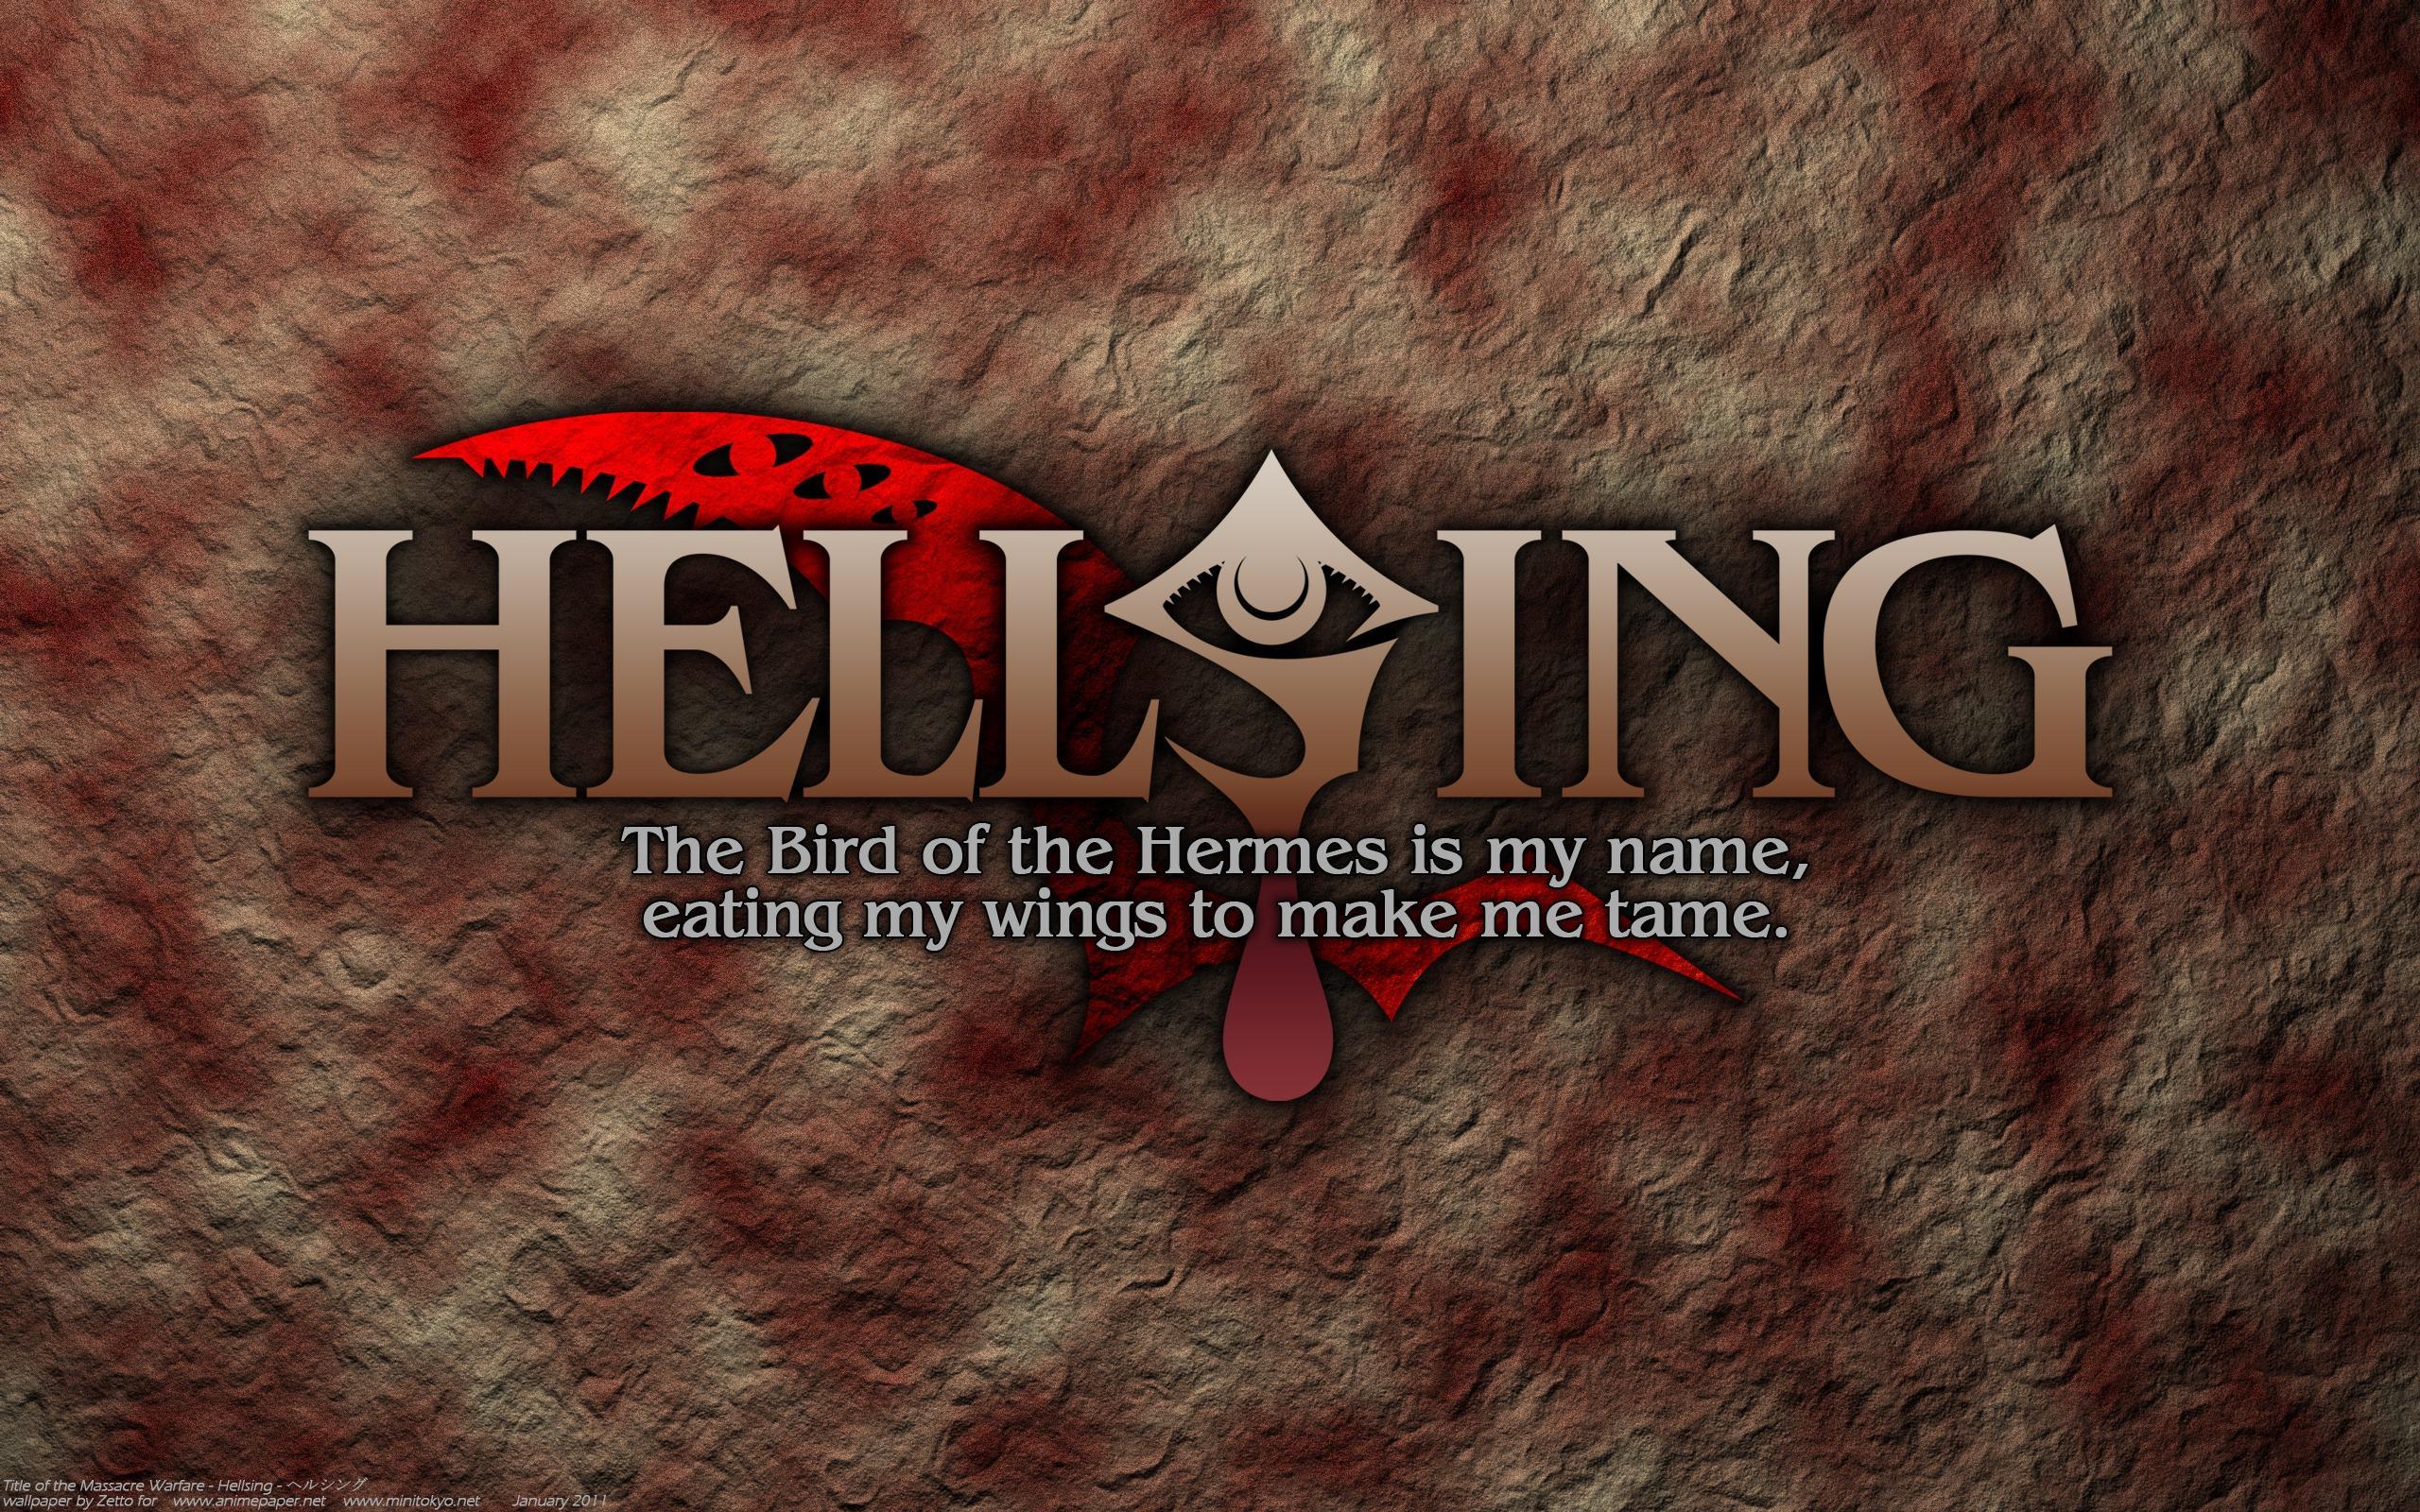 Hellsing Fondo De Pantalla Hd Fondo De Escritorio